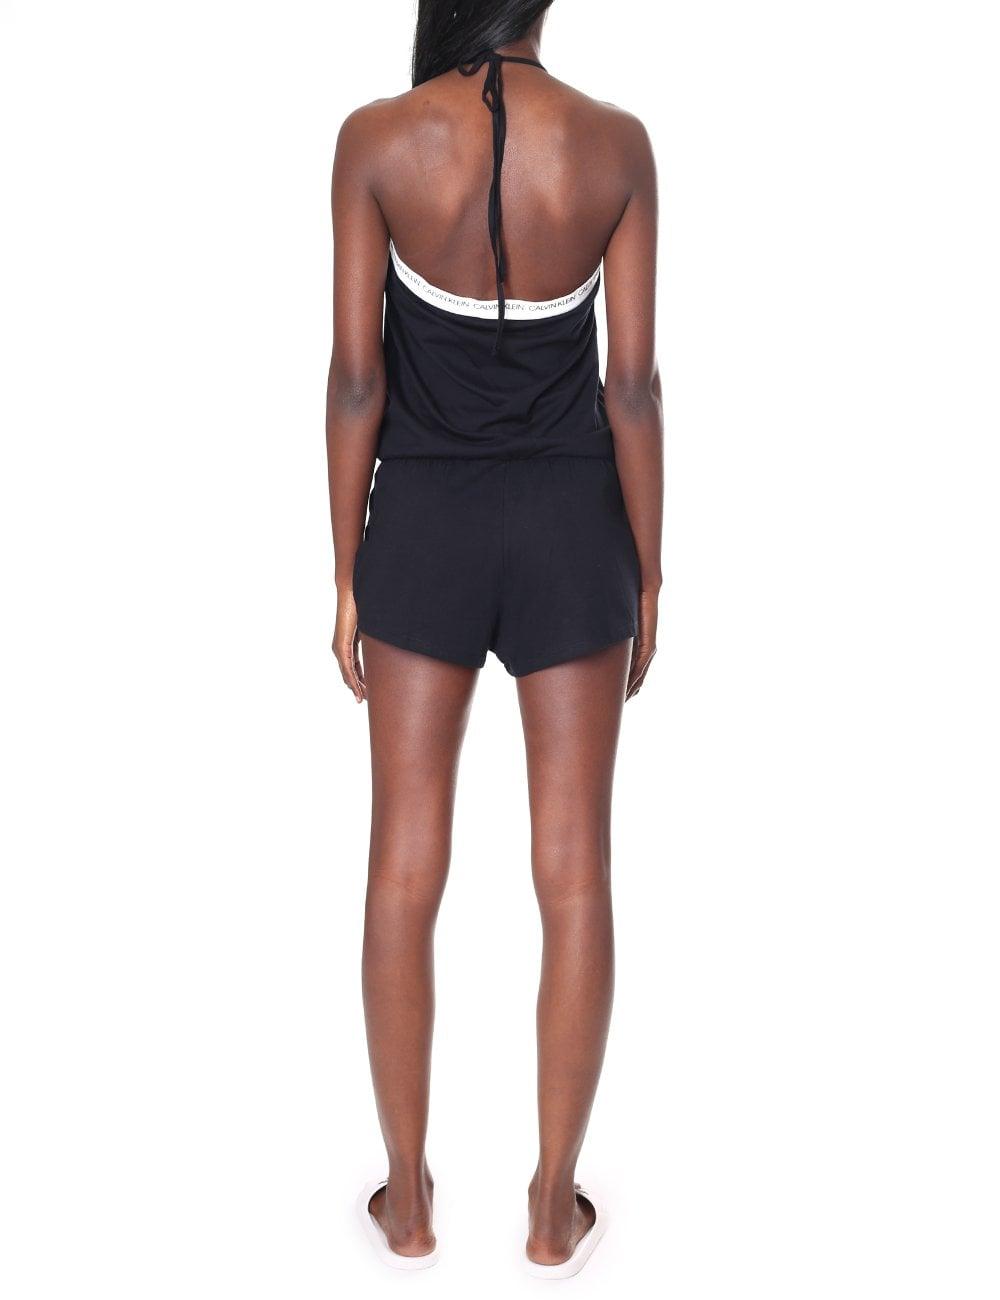 a87d2d66ca5e Calvin Klein Women s Bandeau Romper